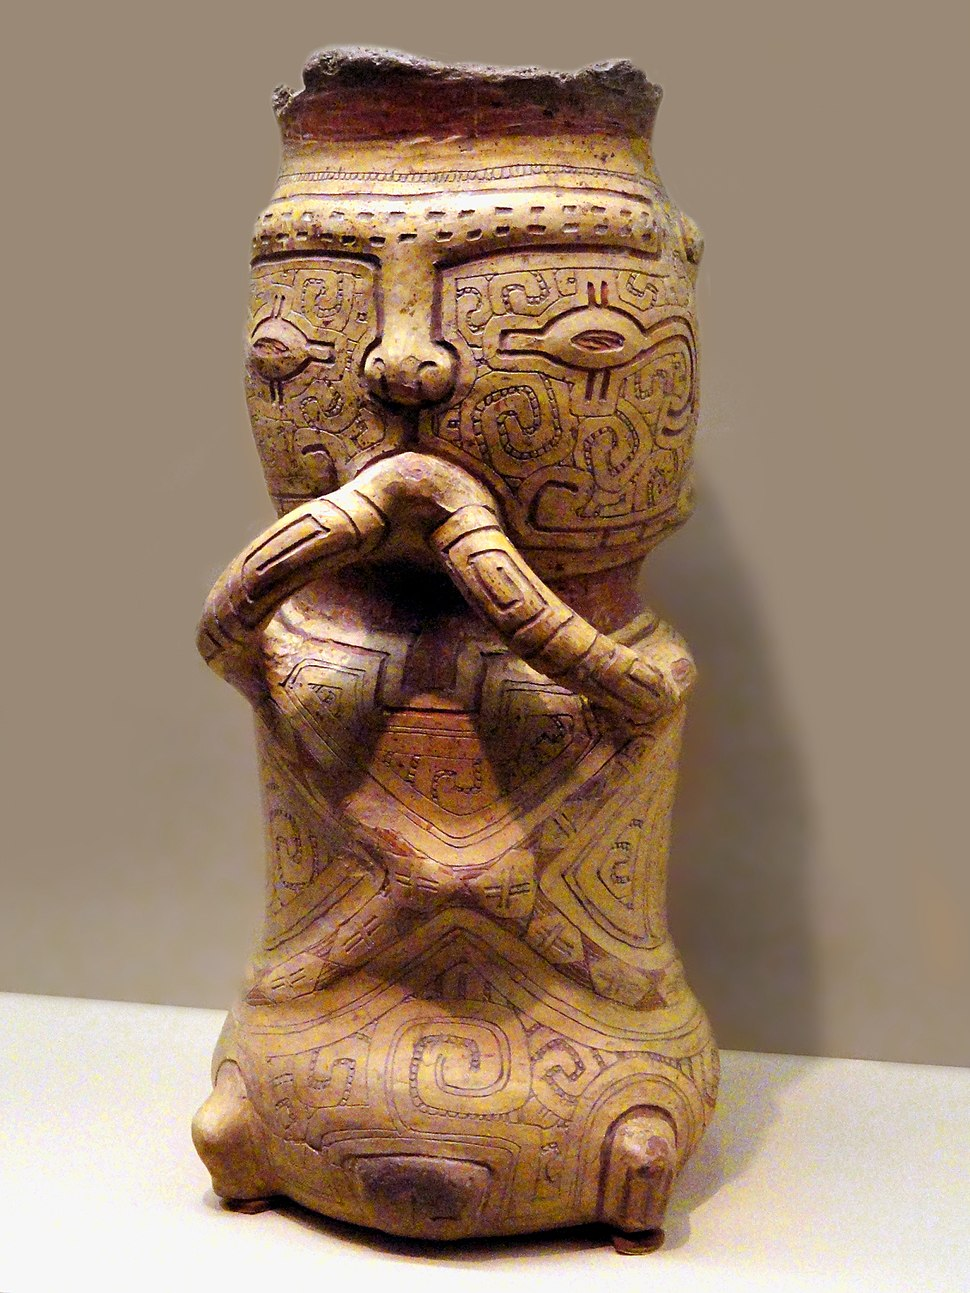 Burian urn, AD 1000-1250, Marajoara culture - AMNH - DSC06177 b